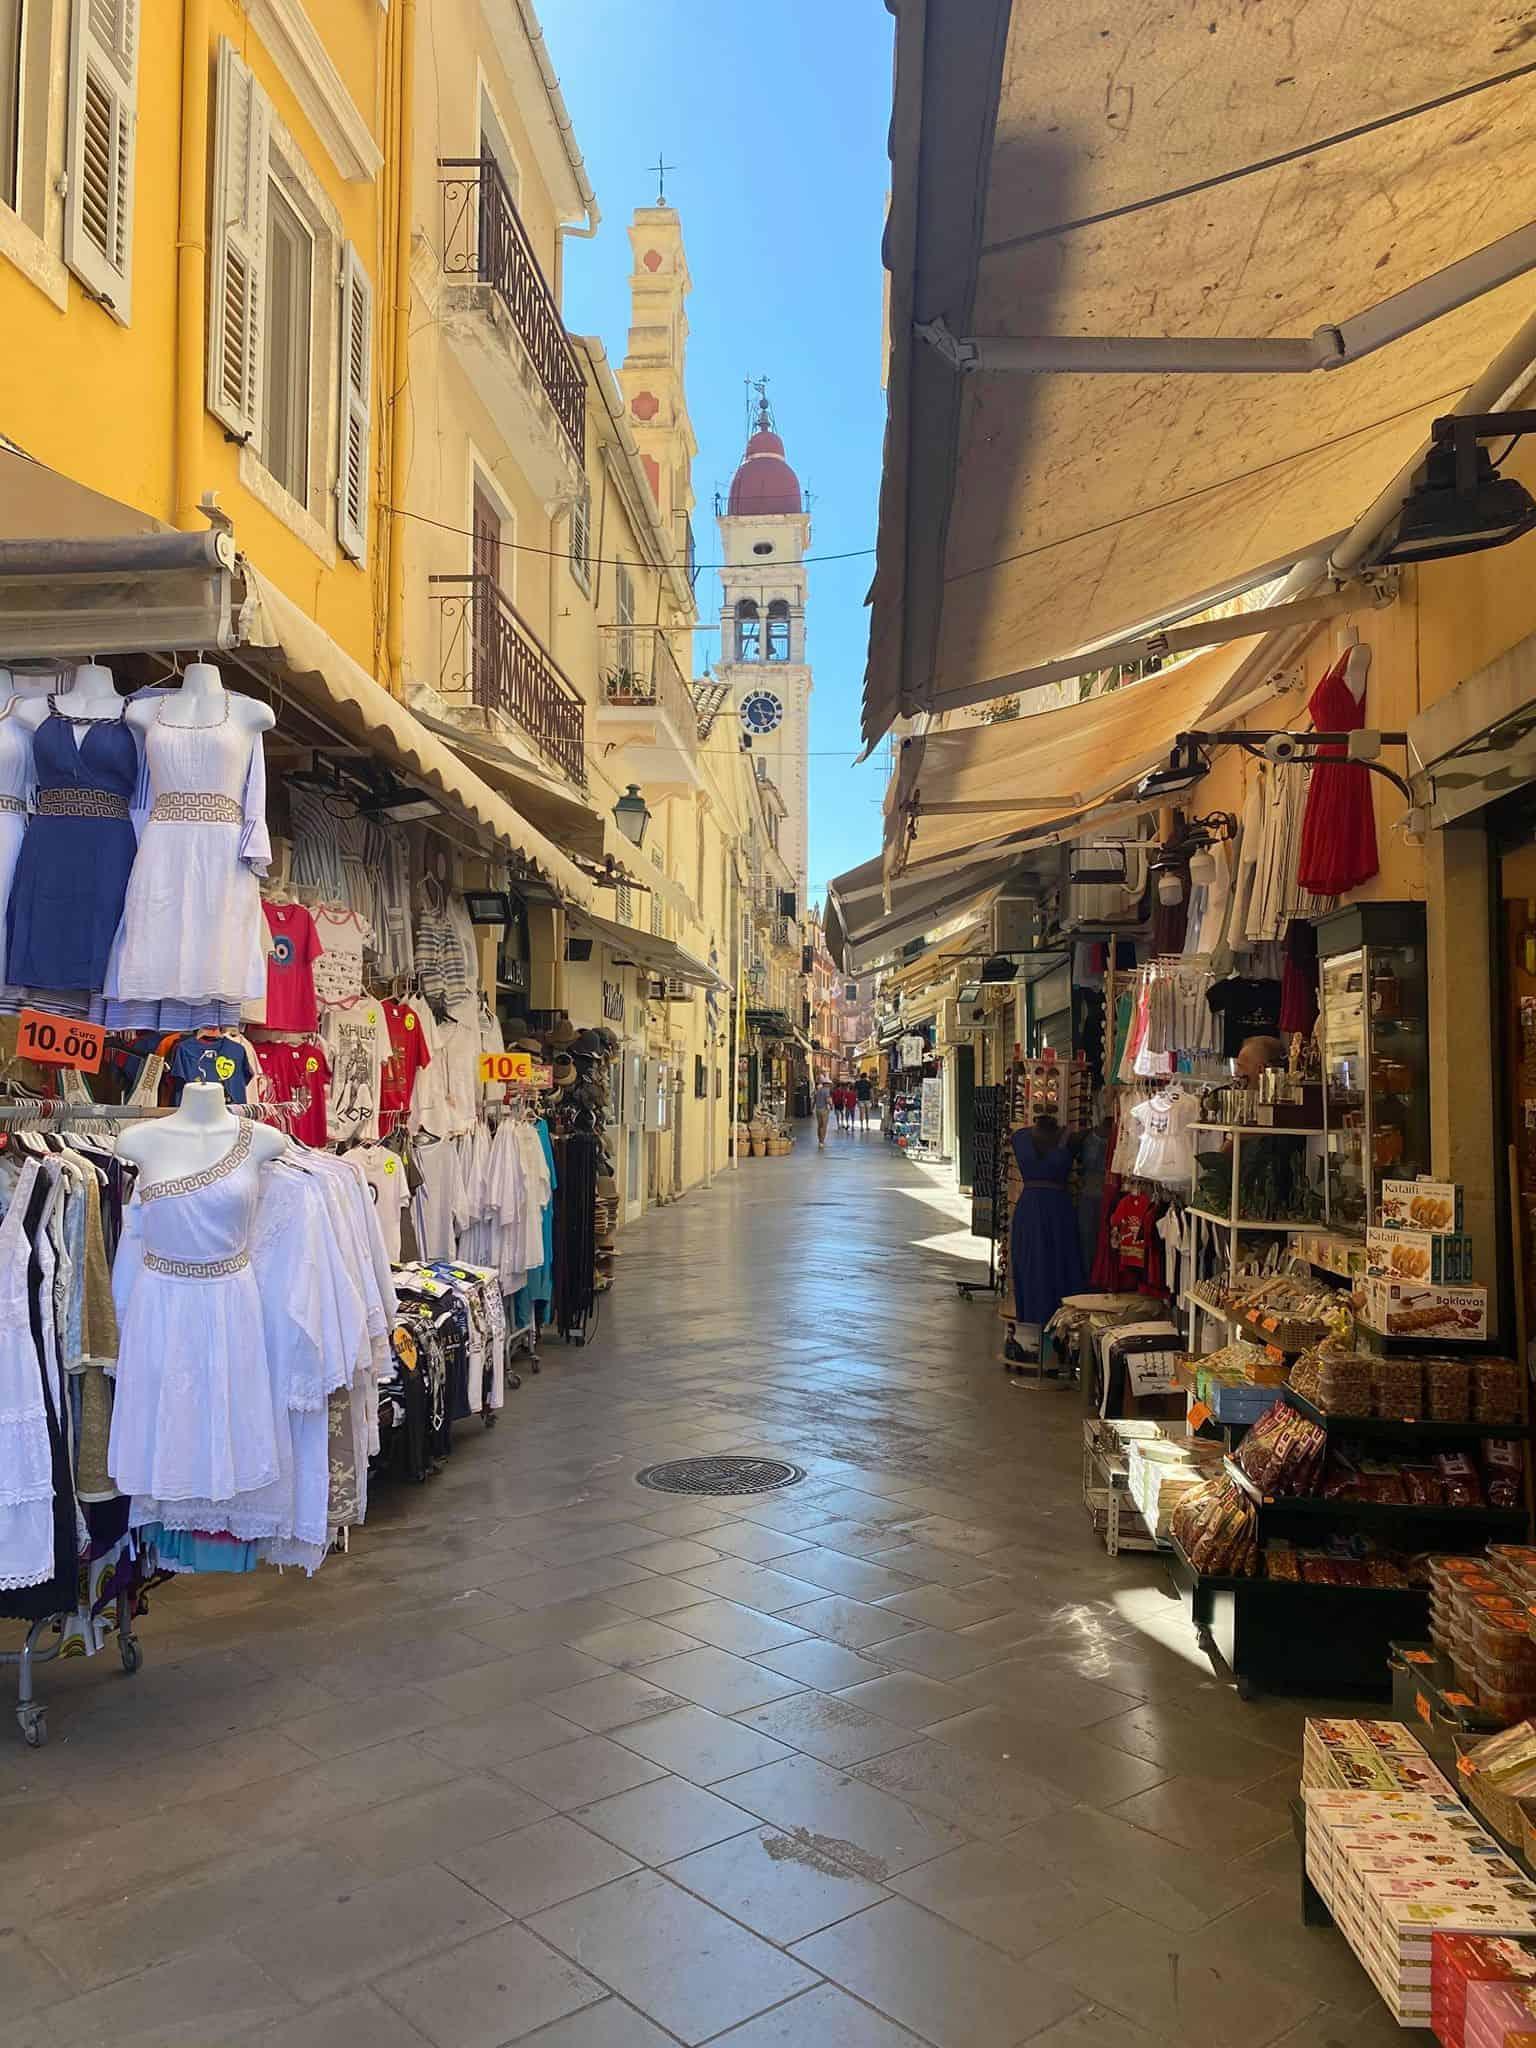 Places to visit in Greece: Corfu (Kerkyra)